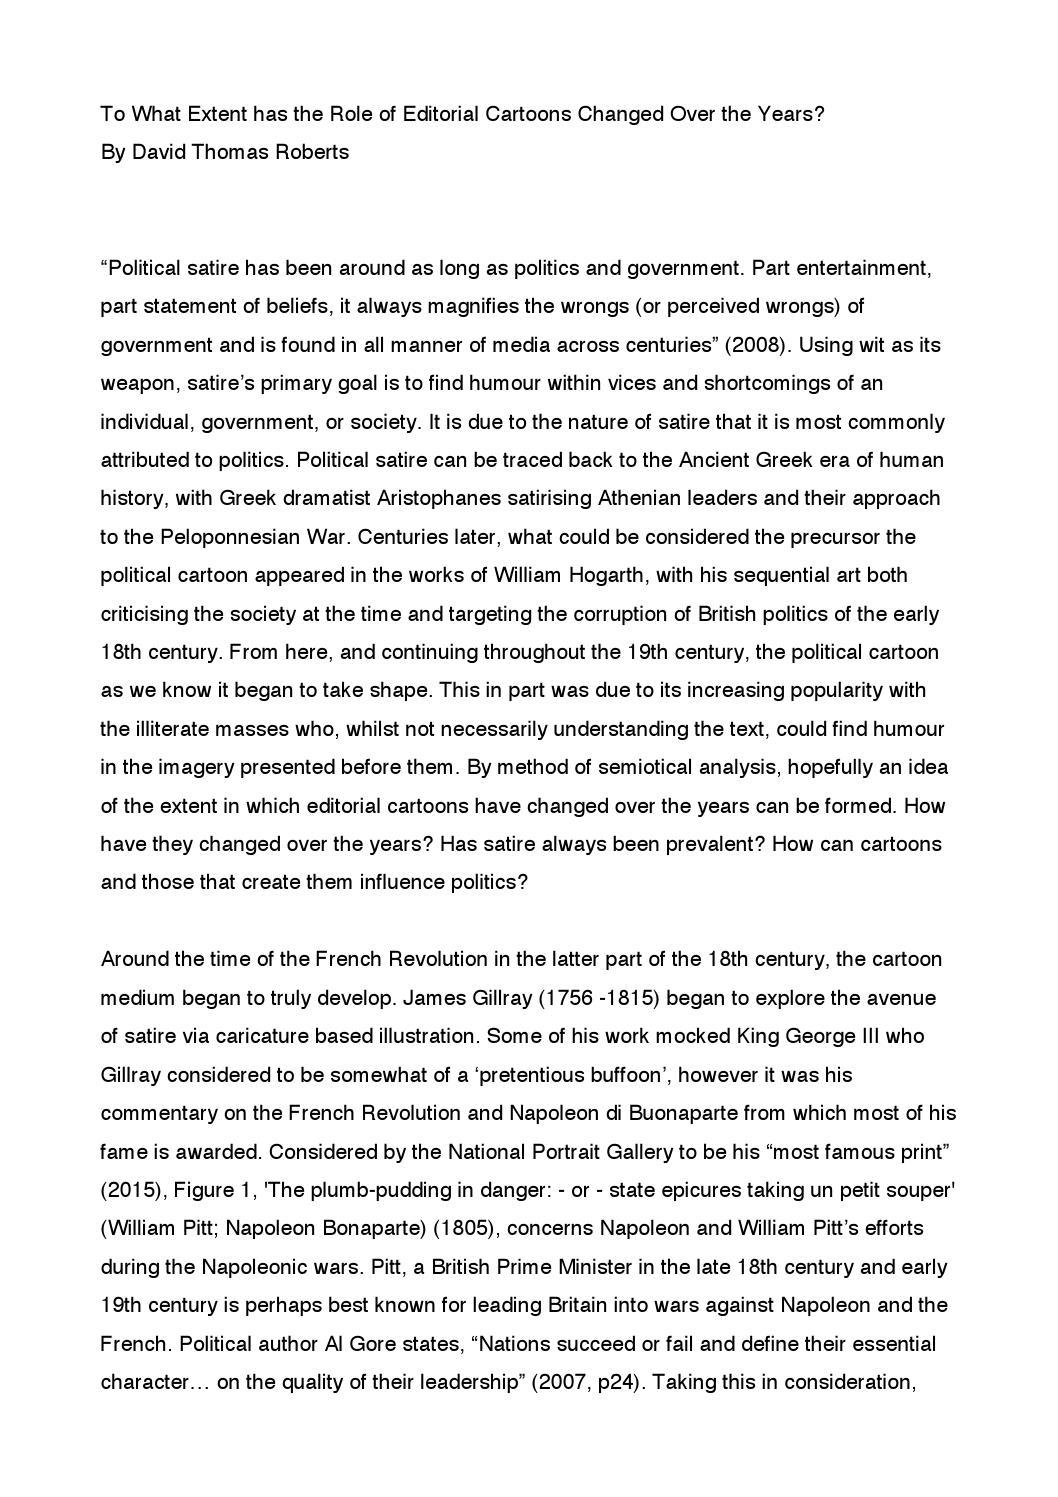 good essay on the napoleonic wars